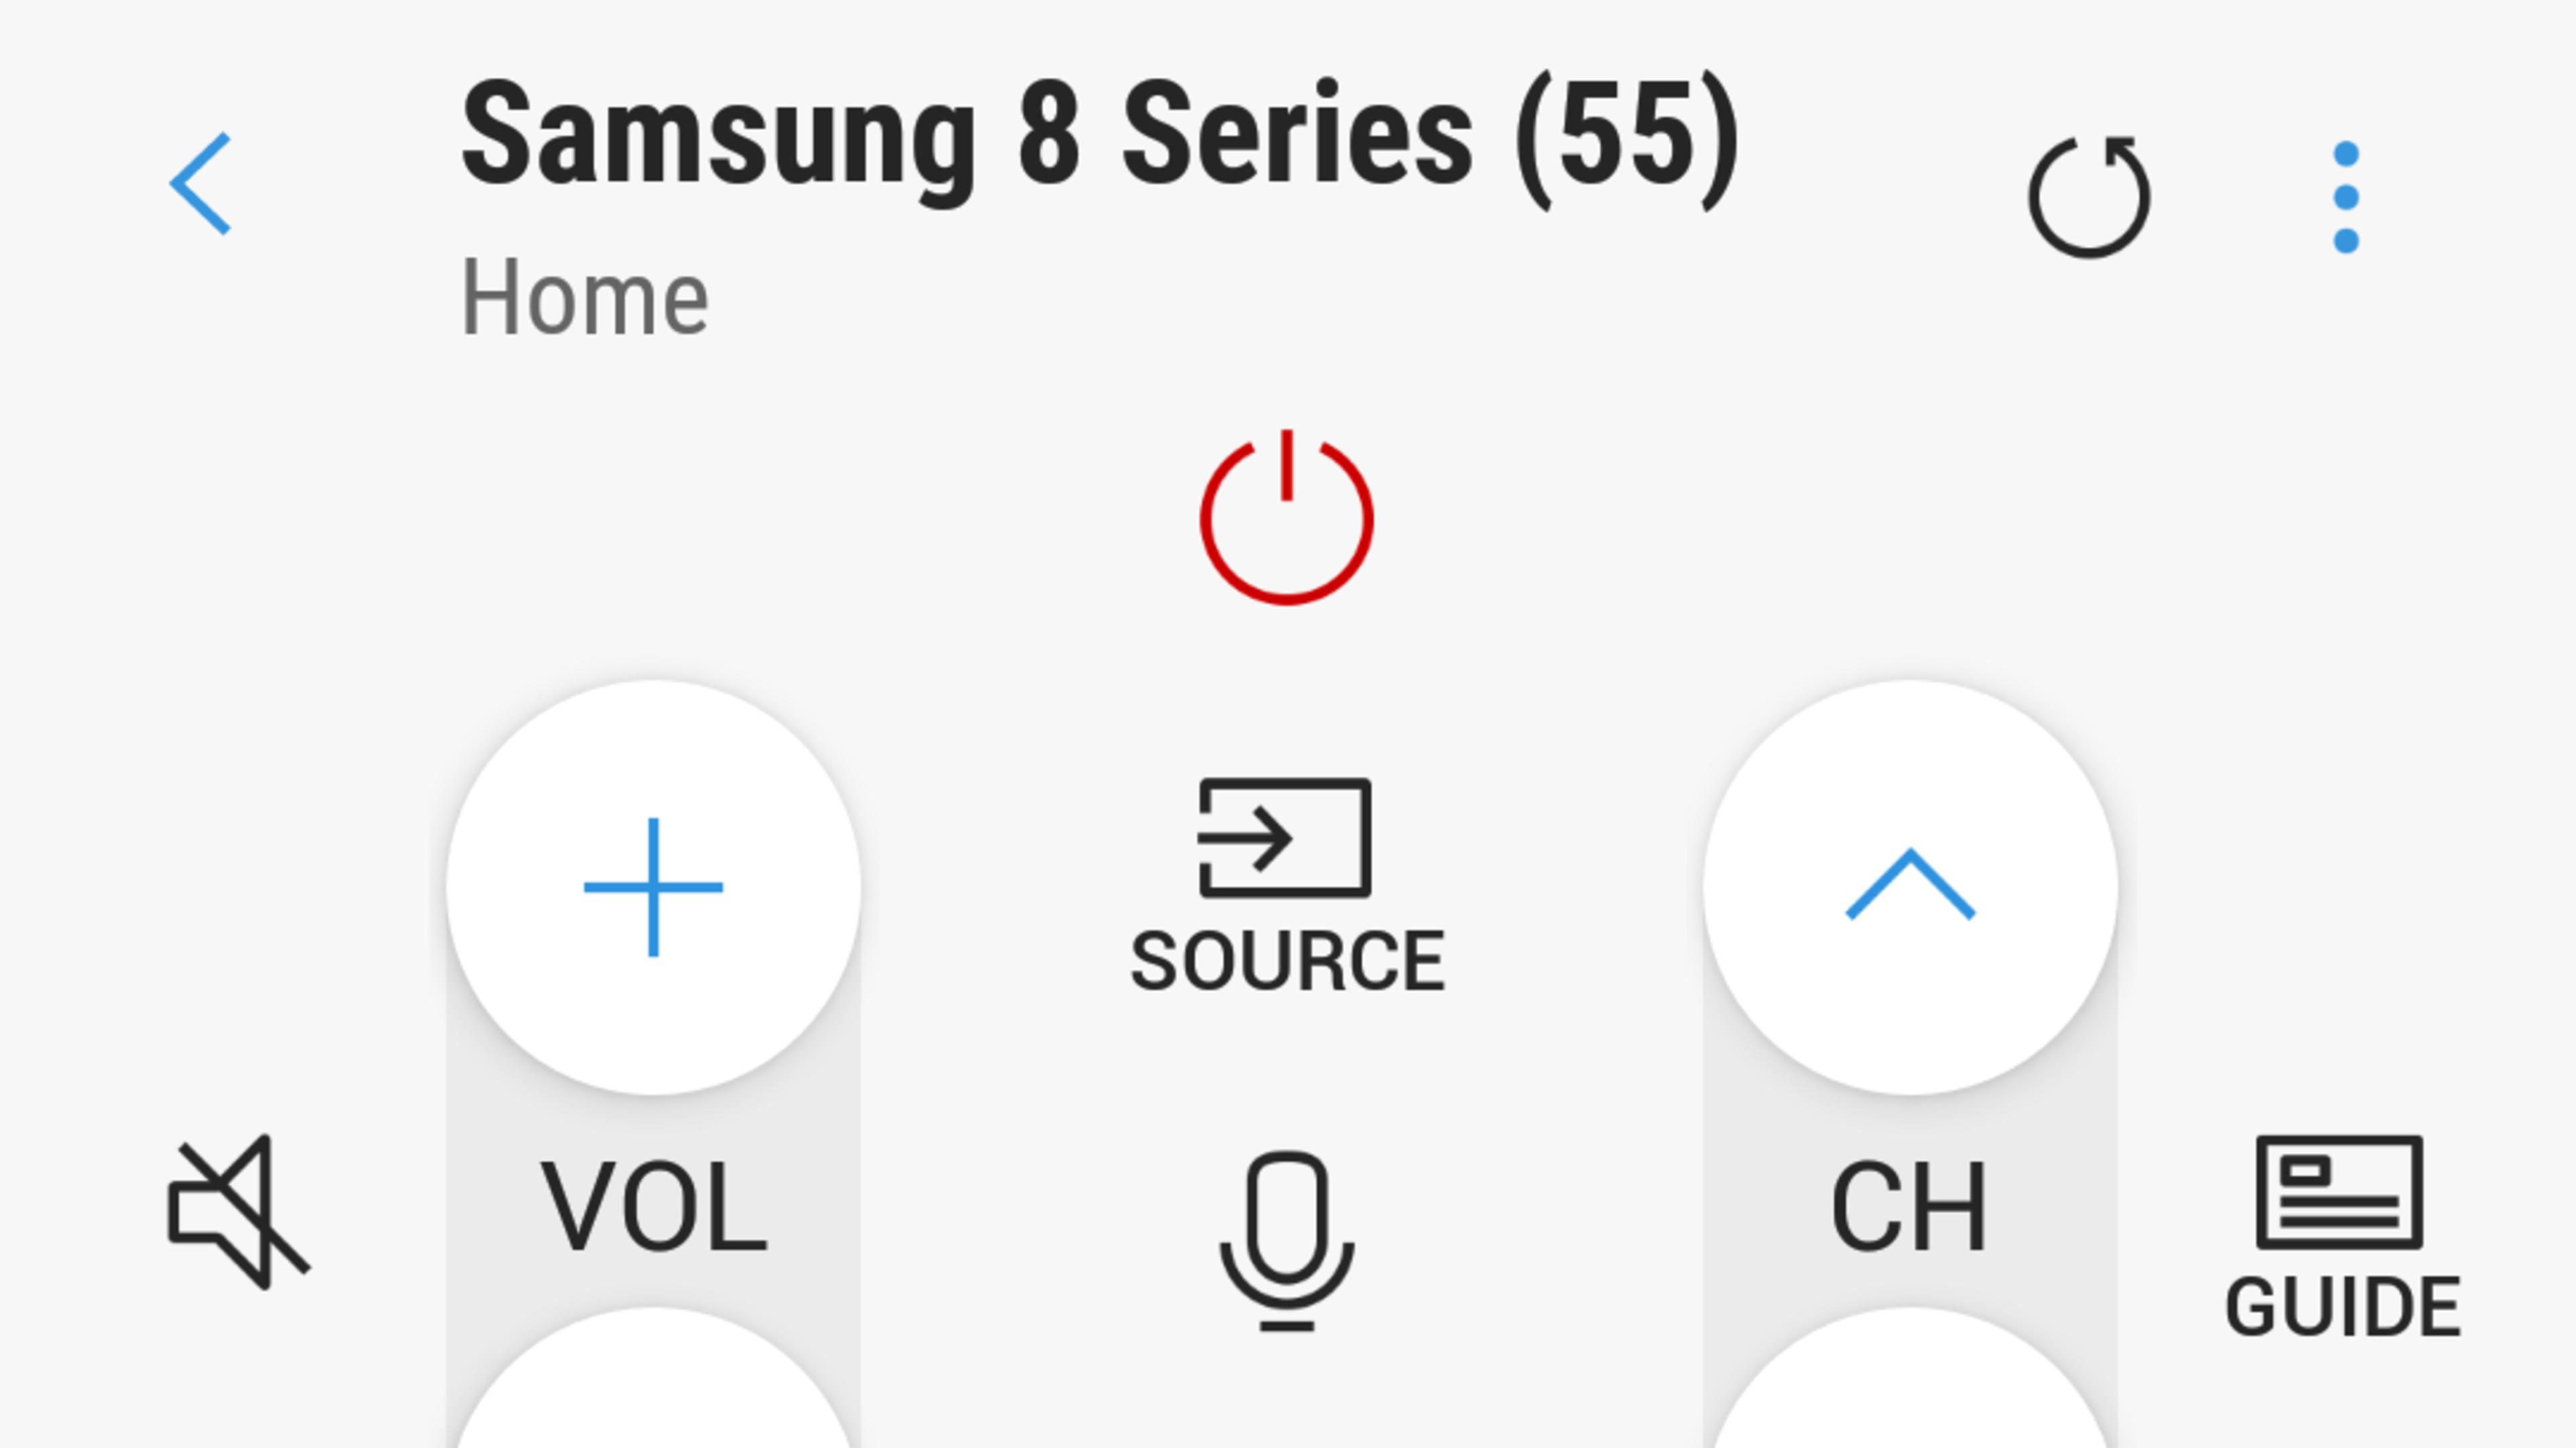 Samsung NU8000 Review (UN49NU8000, UN55NU8000, UN65NU8000